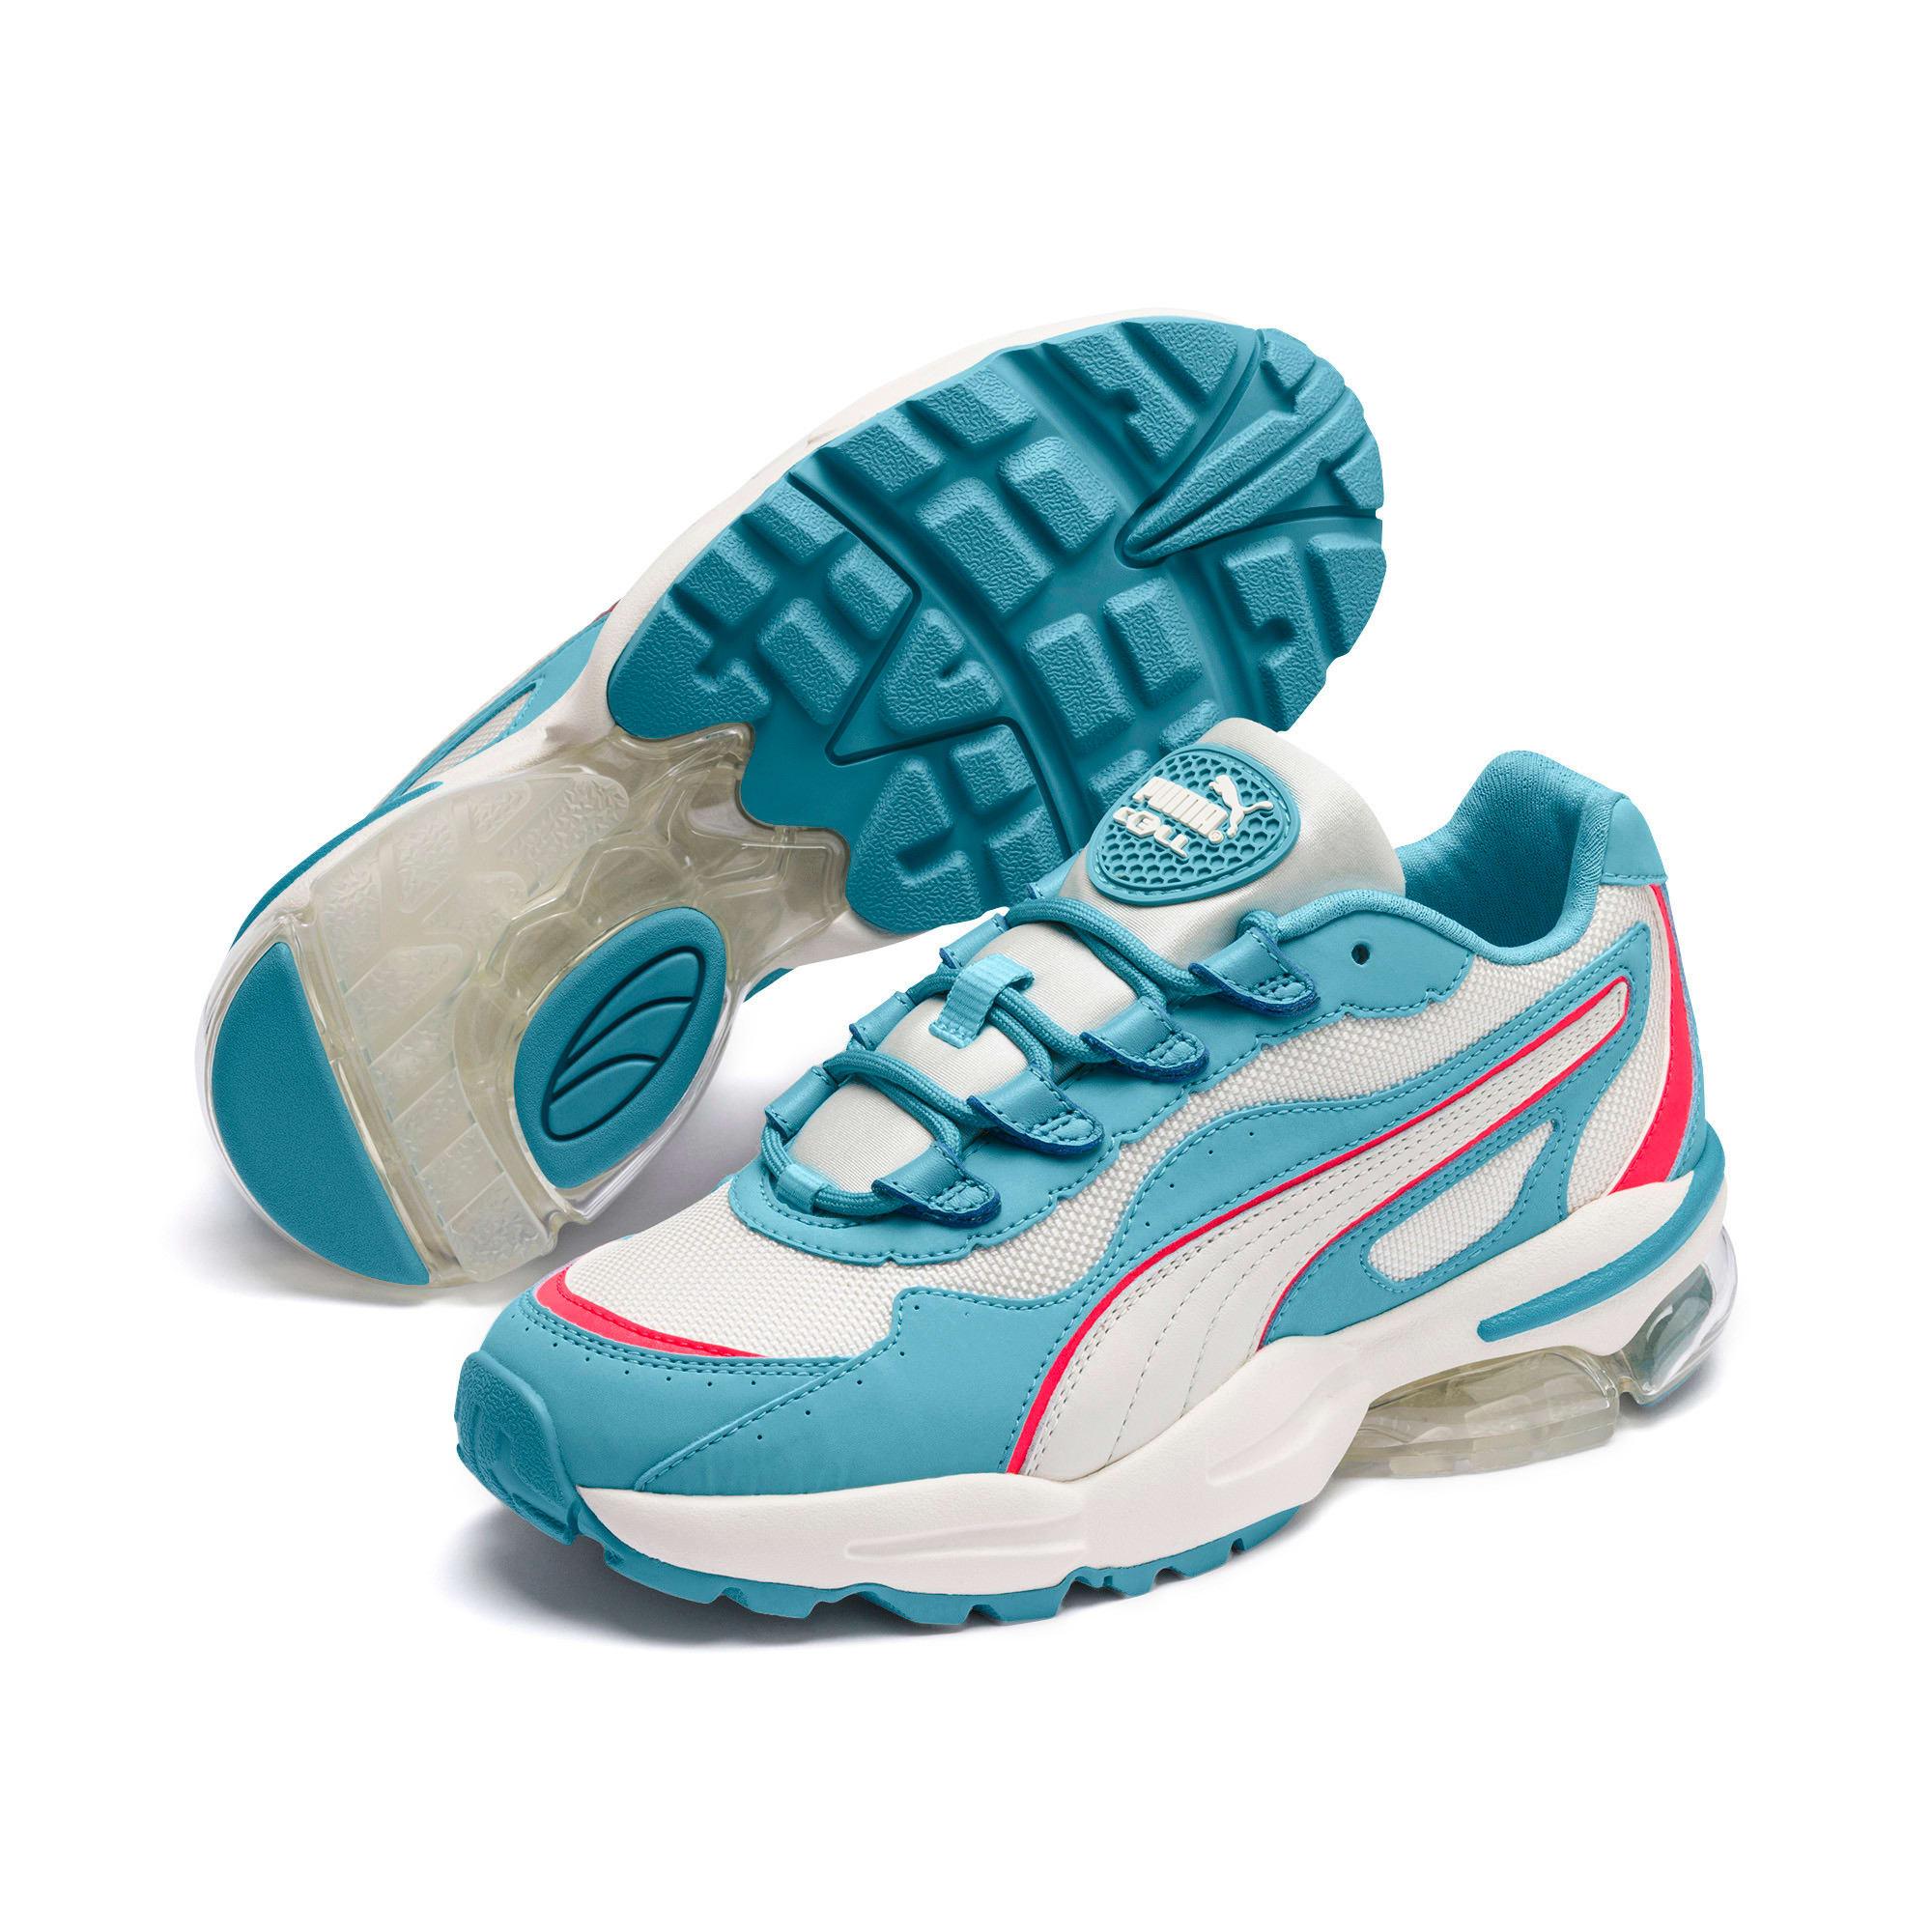 Miniatura 3 de Zapatos deportivos CELL Stellar para mujer, Milky Blue-Puma Team Gold, mediano